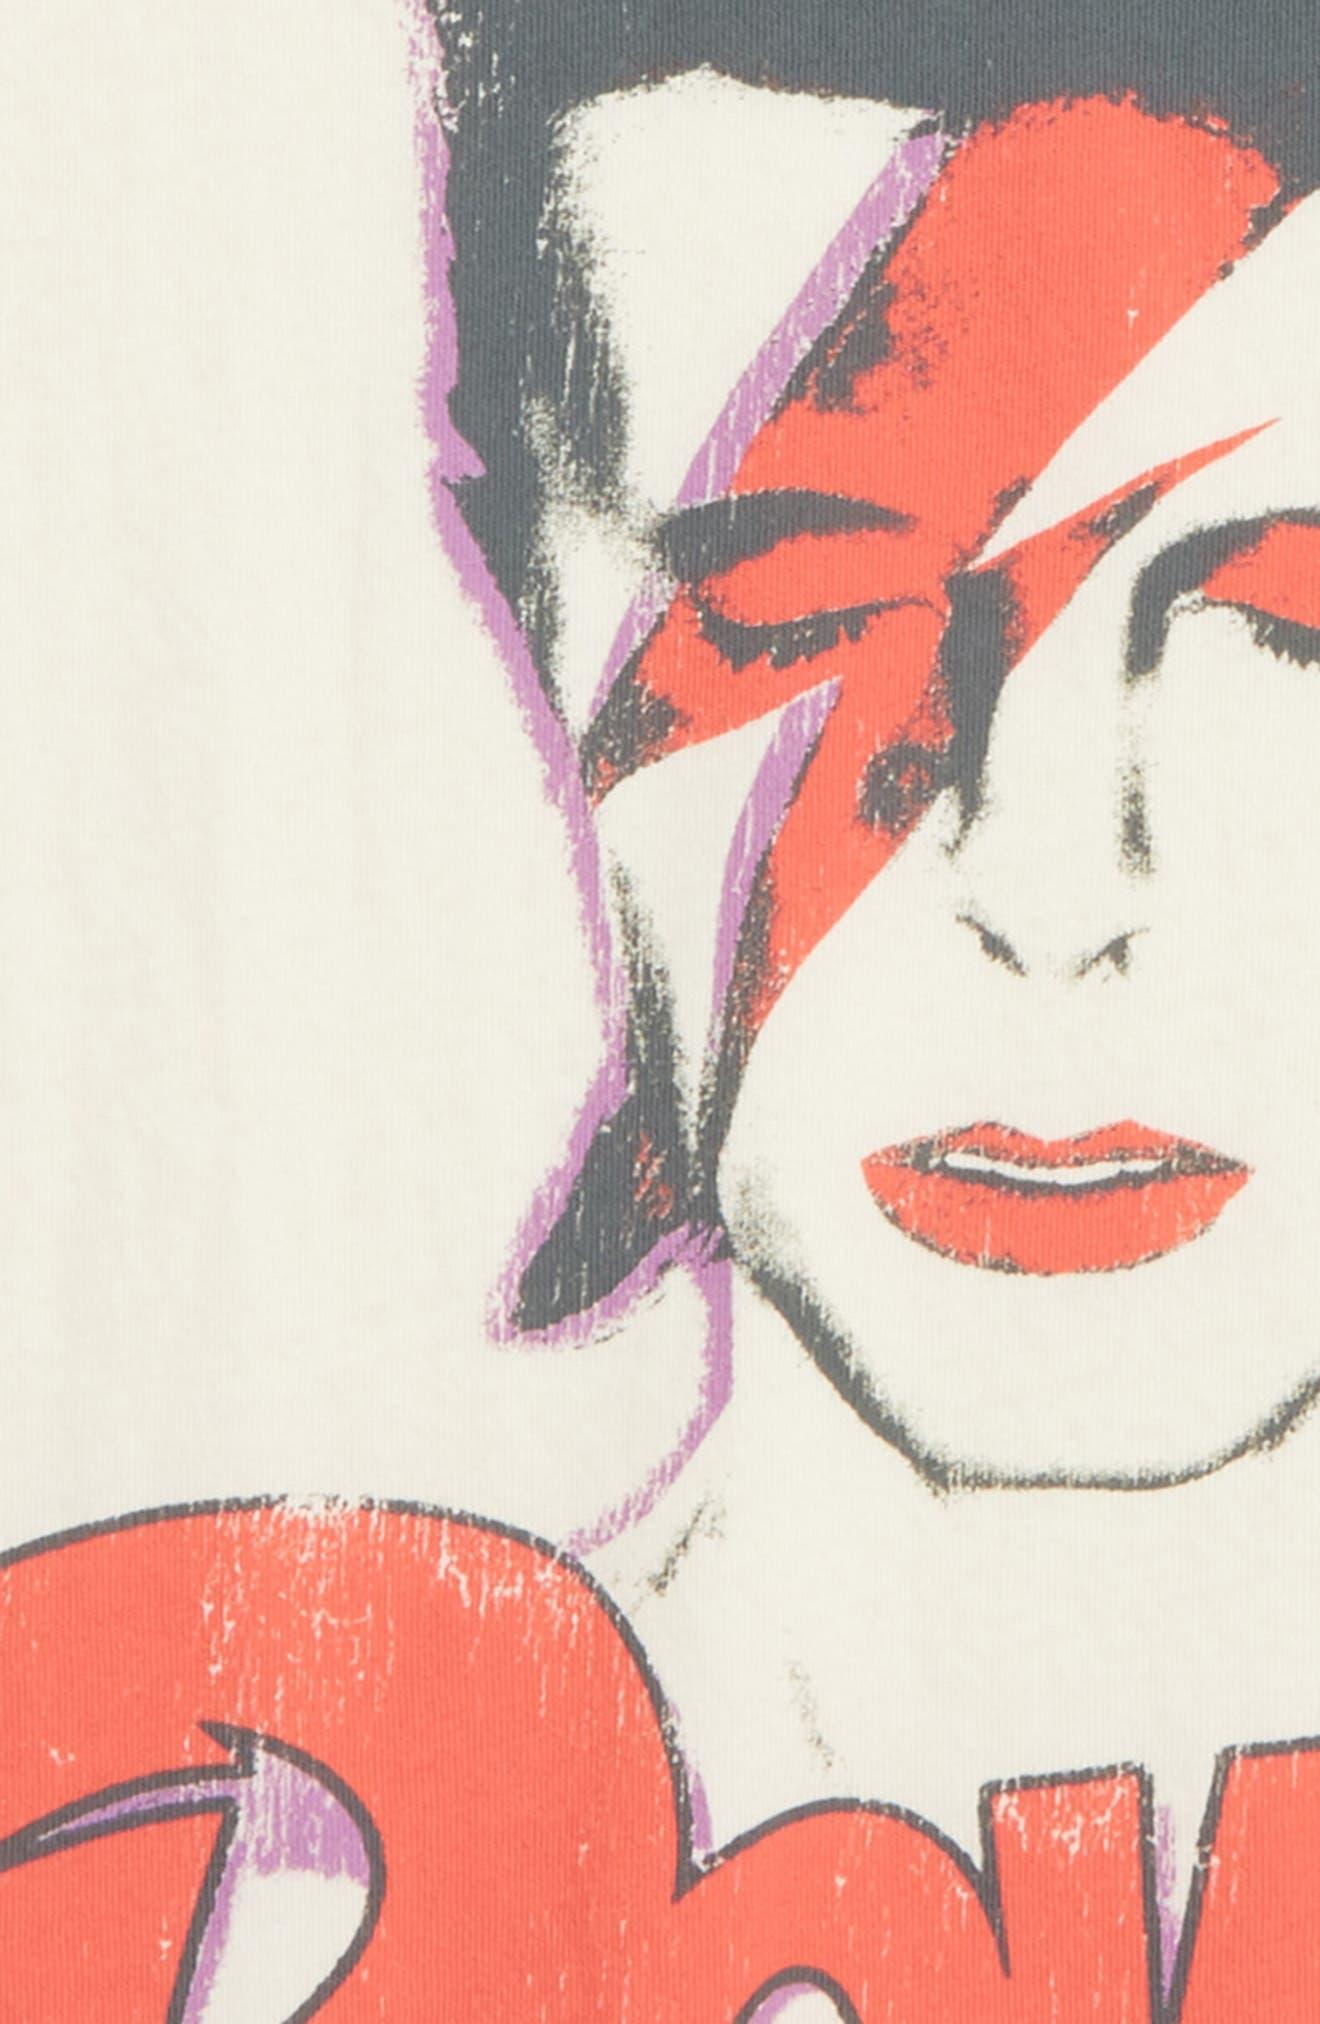 Bowie Distressed Cotton Tank,                             Alternate thumbnail 2, color,                             902